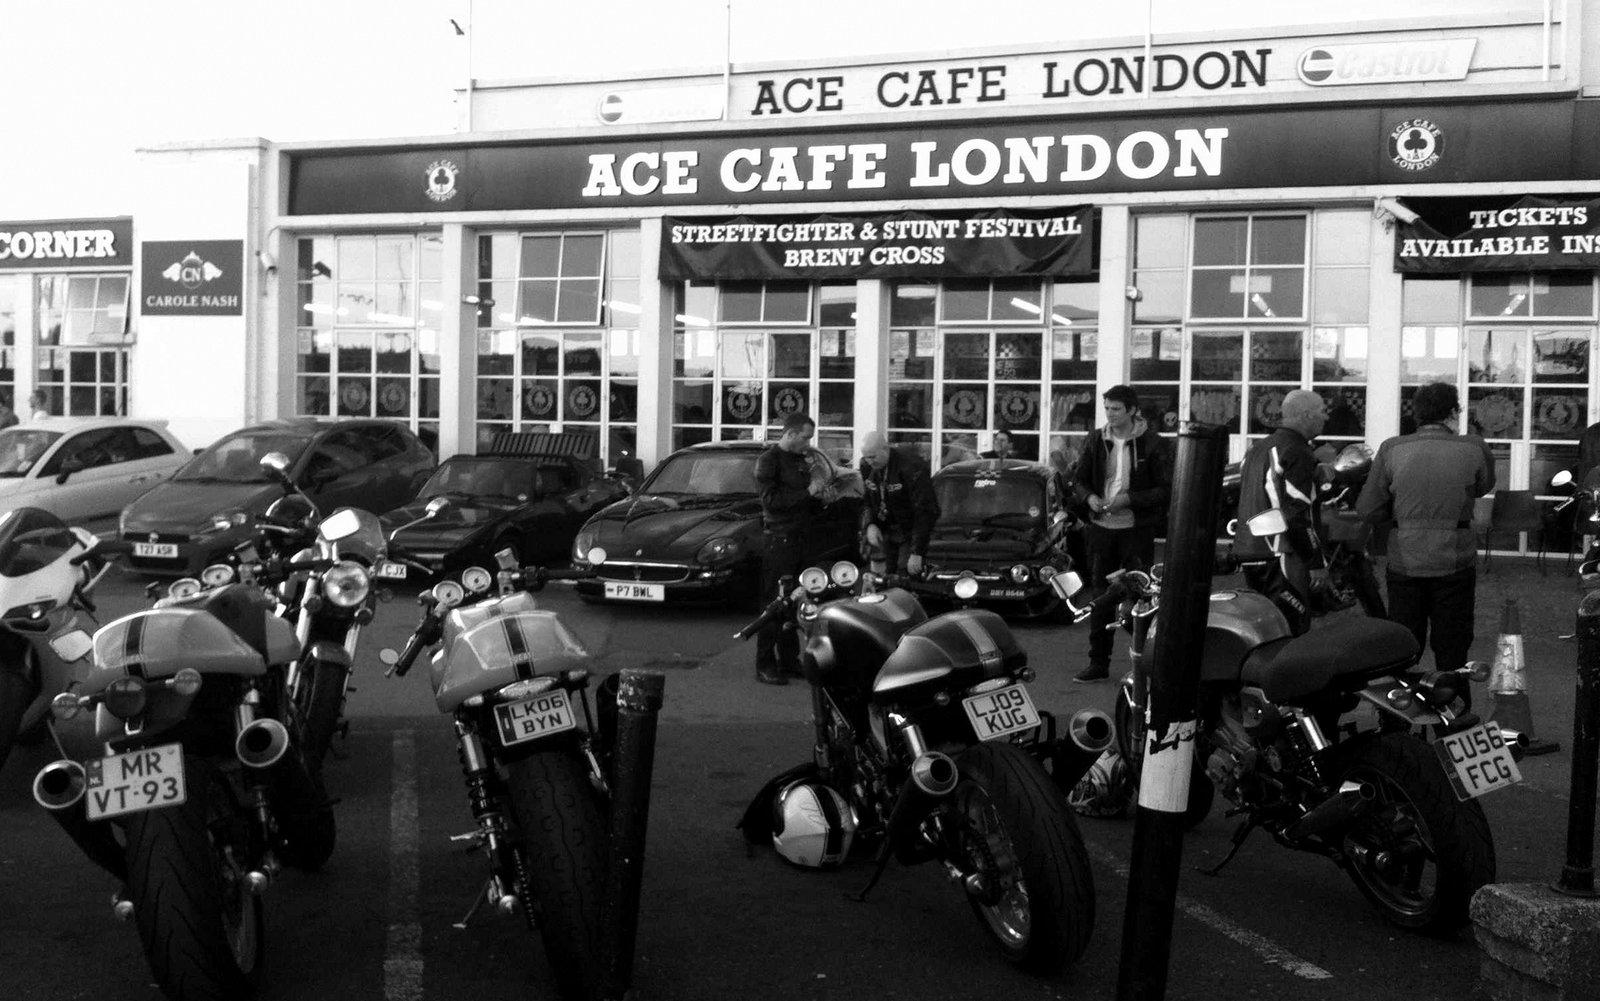 Motorcycle Shop North London